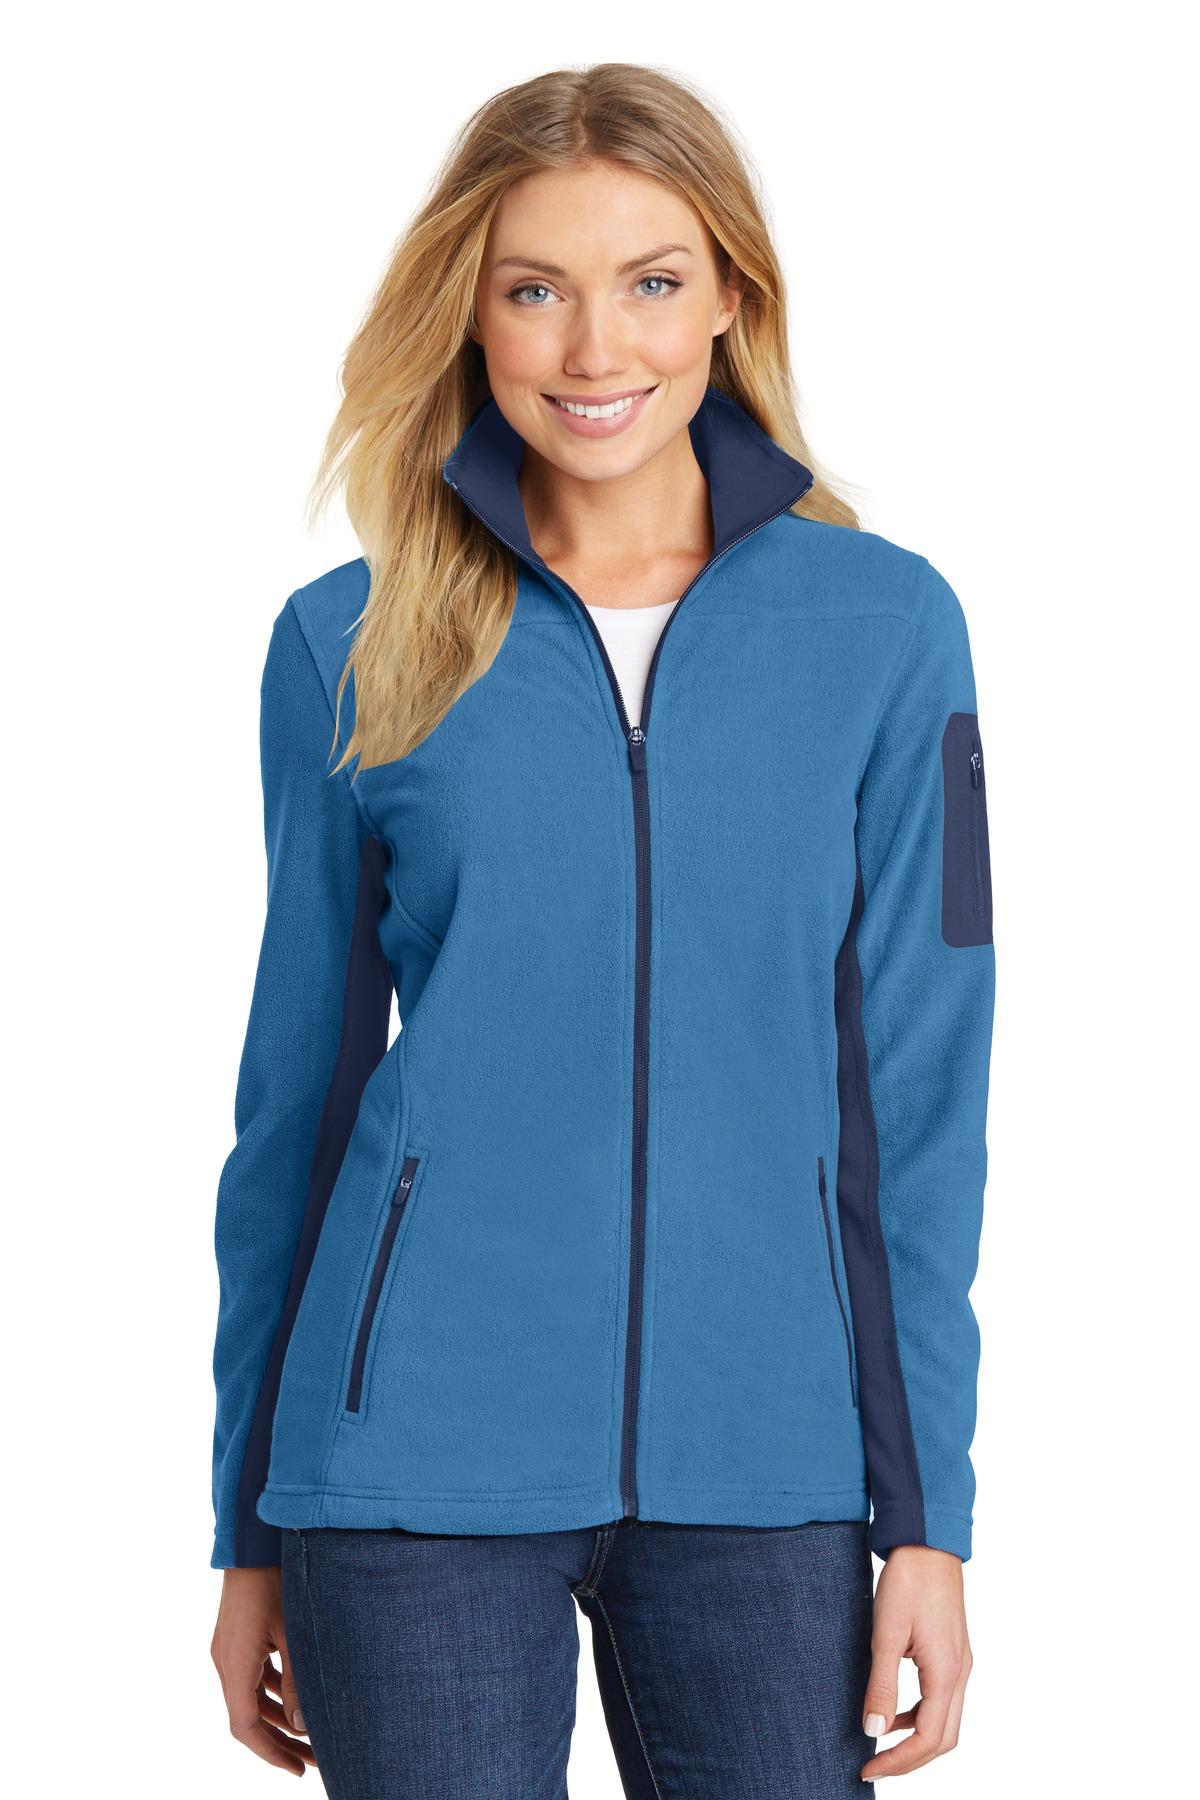 Port Authority  L233 - Ladies Summit Fleece Full-Zip Jacket